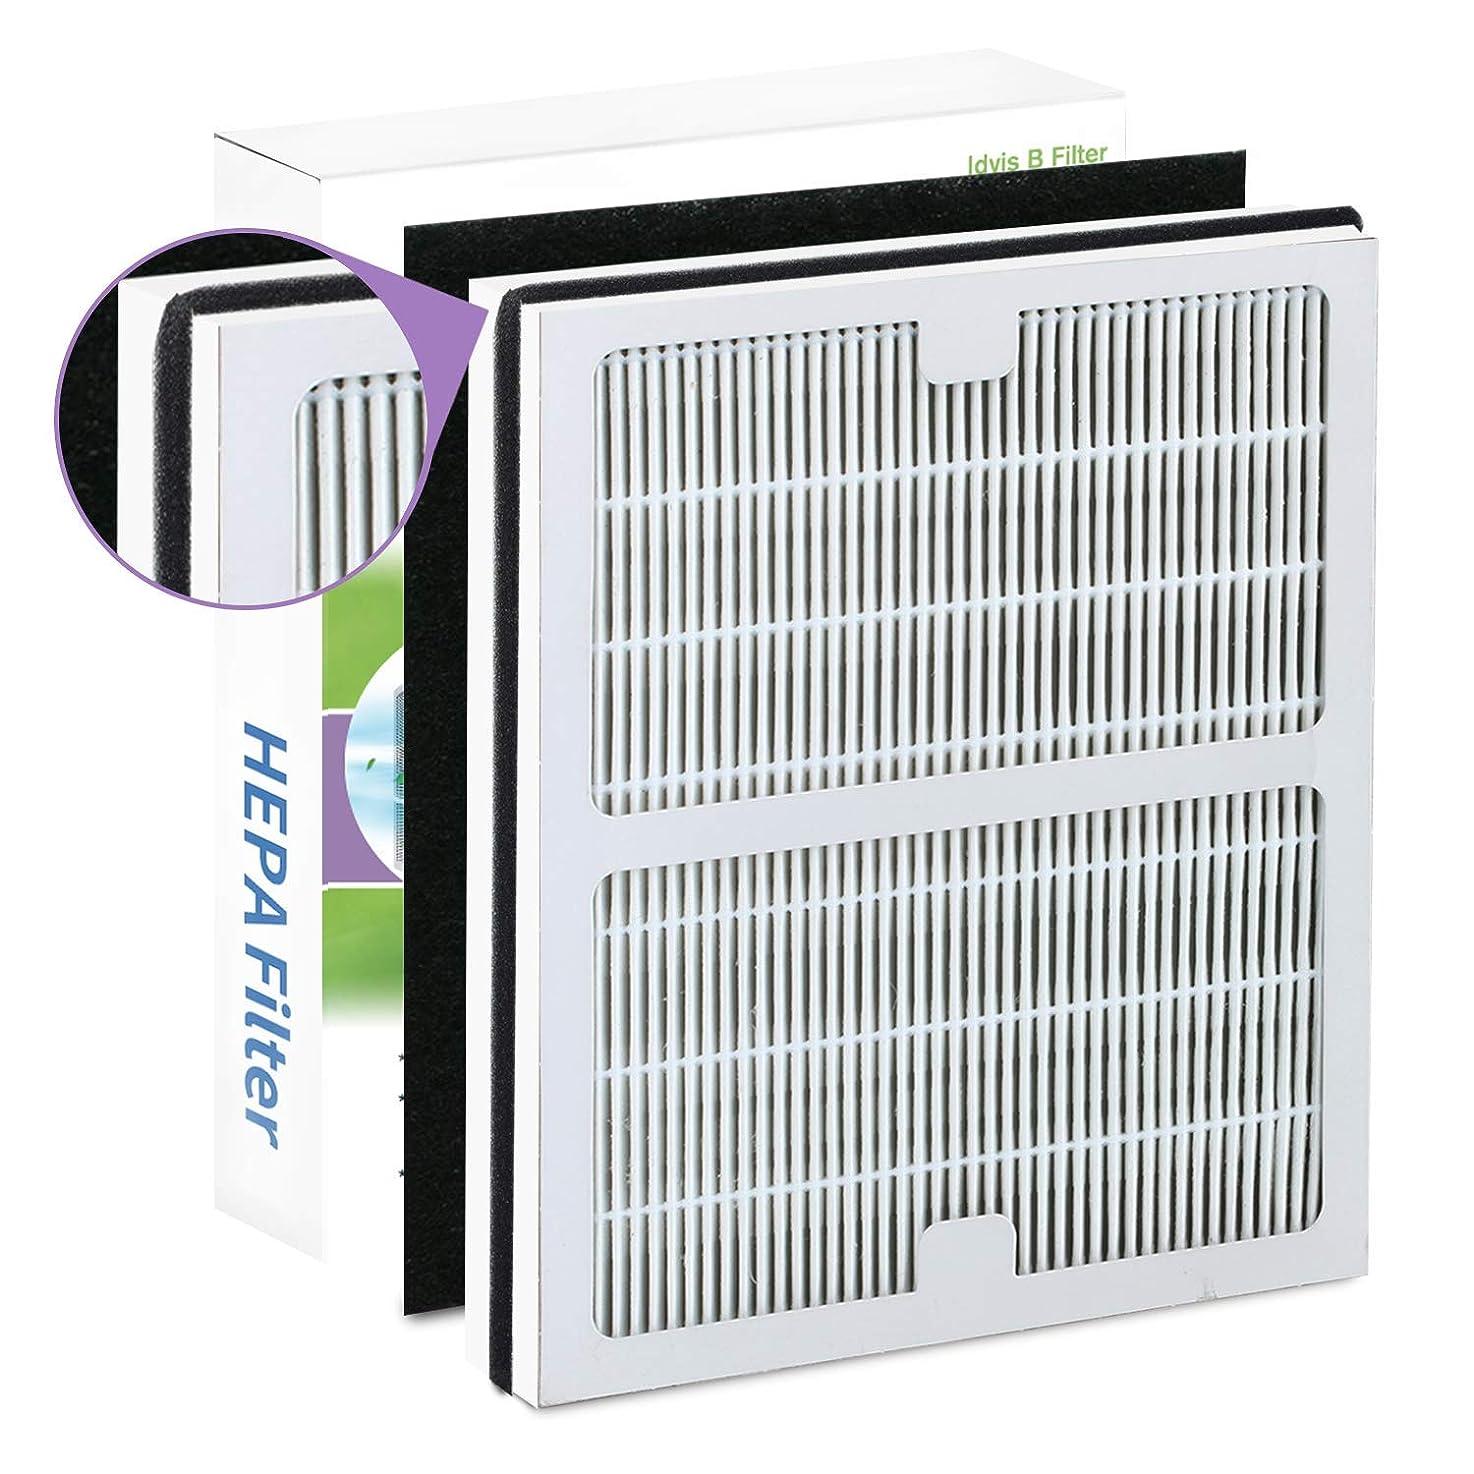 Compatible Idylis B Air Purifier Filters for Idylis AC-2125, AC-2126, IAP-10-125, IAPC-40-140, IAP-10-150, IAP-10-050, Model # IAF-H-100B, Includes 1 HEPA & 1 Carbon Filters